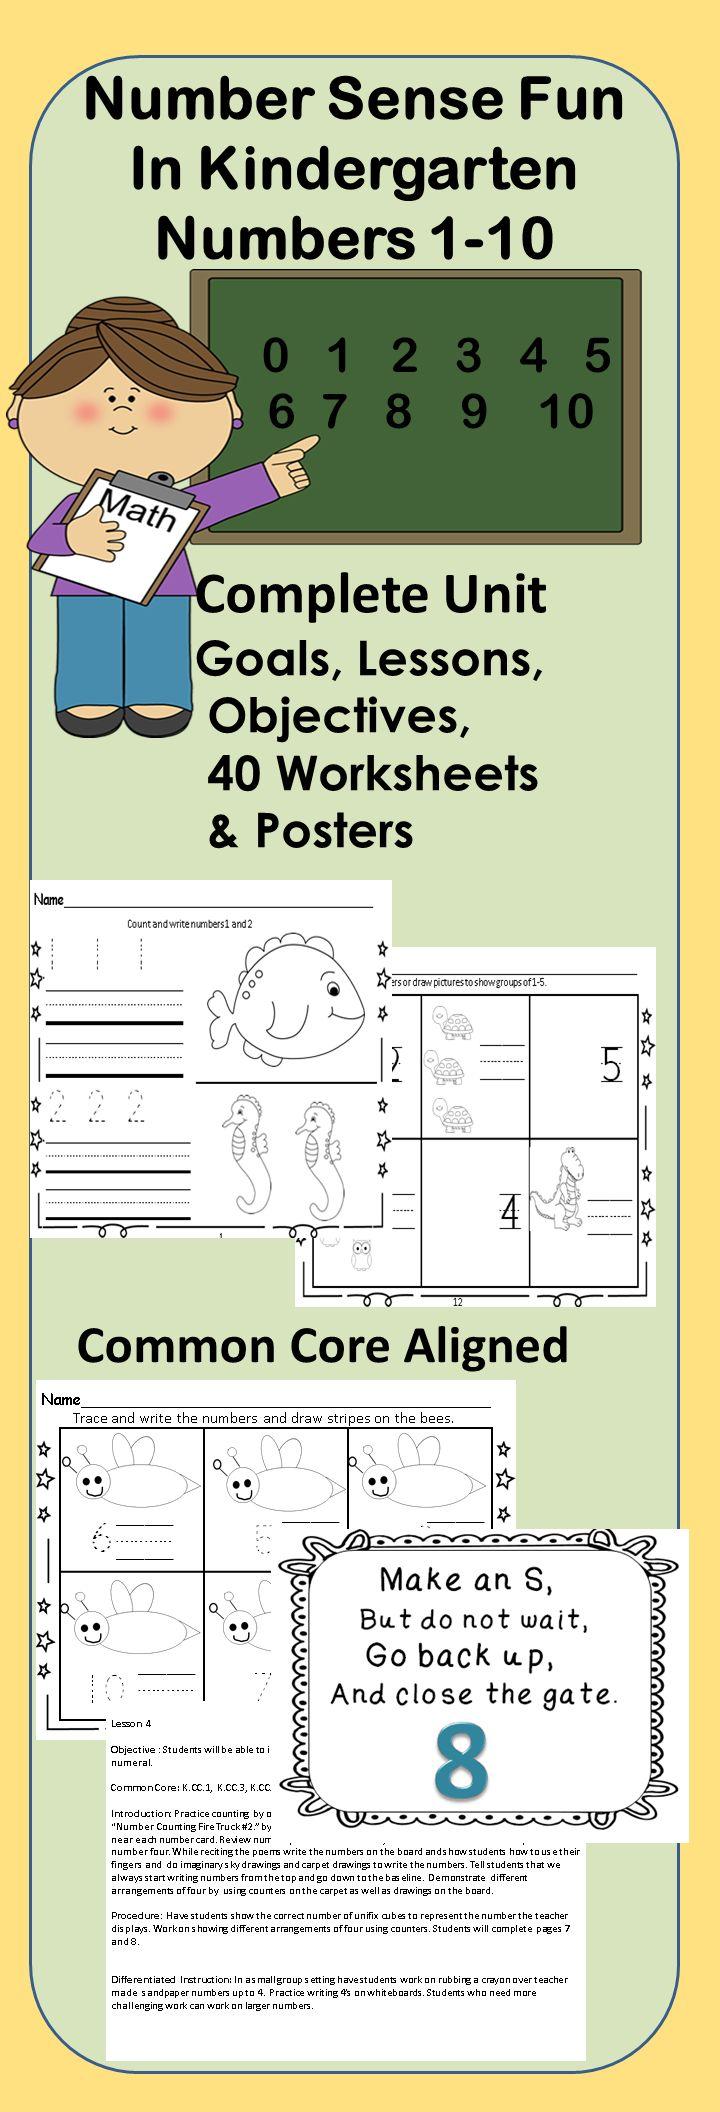 405 best Mathematics K-2 images on Pinterest | Preschool, Early ...